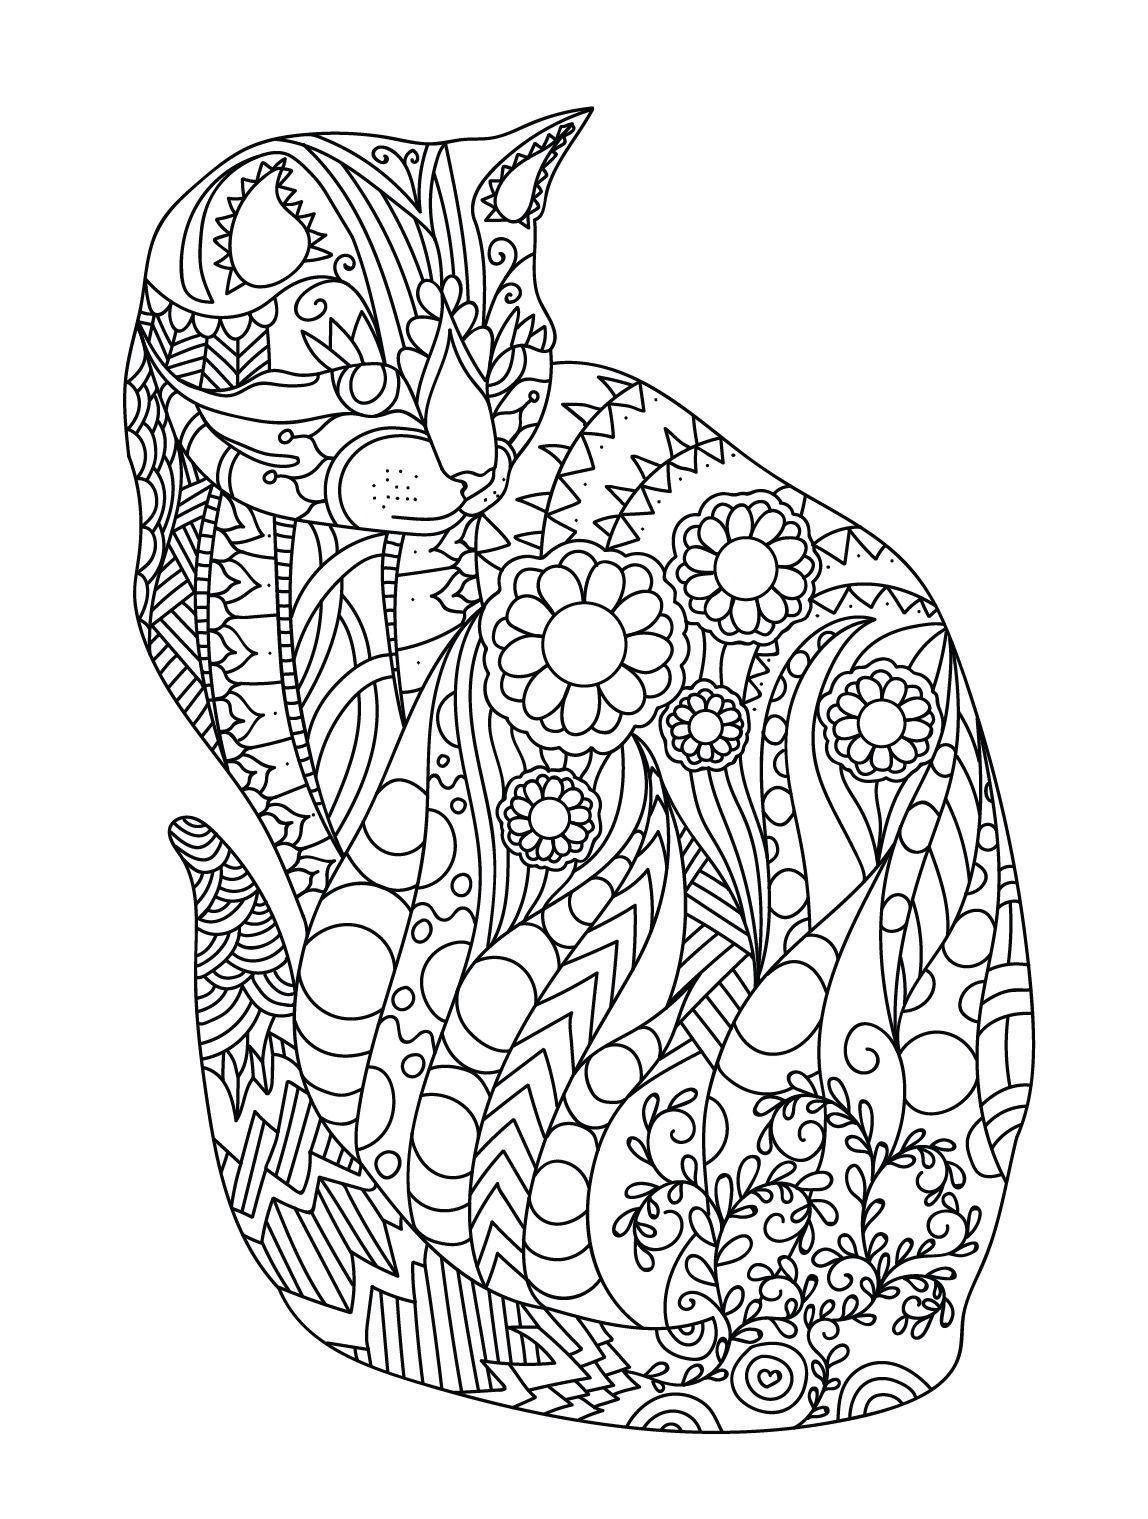 1148x1519 Cat Colorish Coloring Book For Adults Mandala Relax